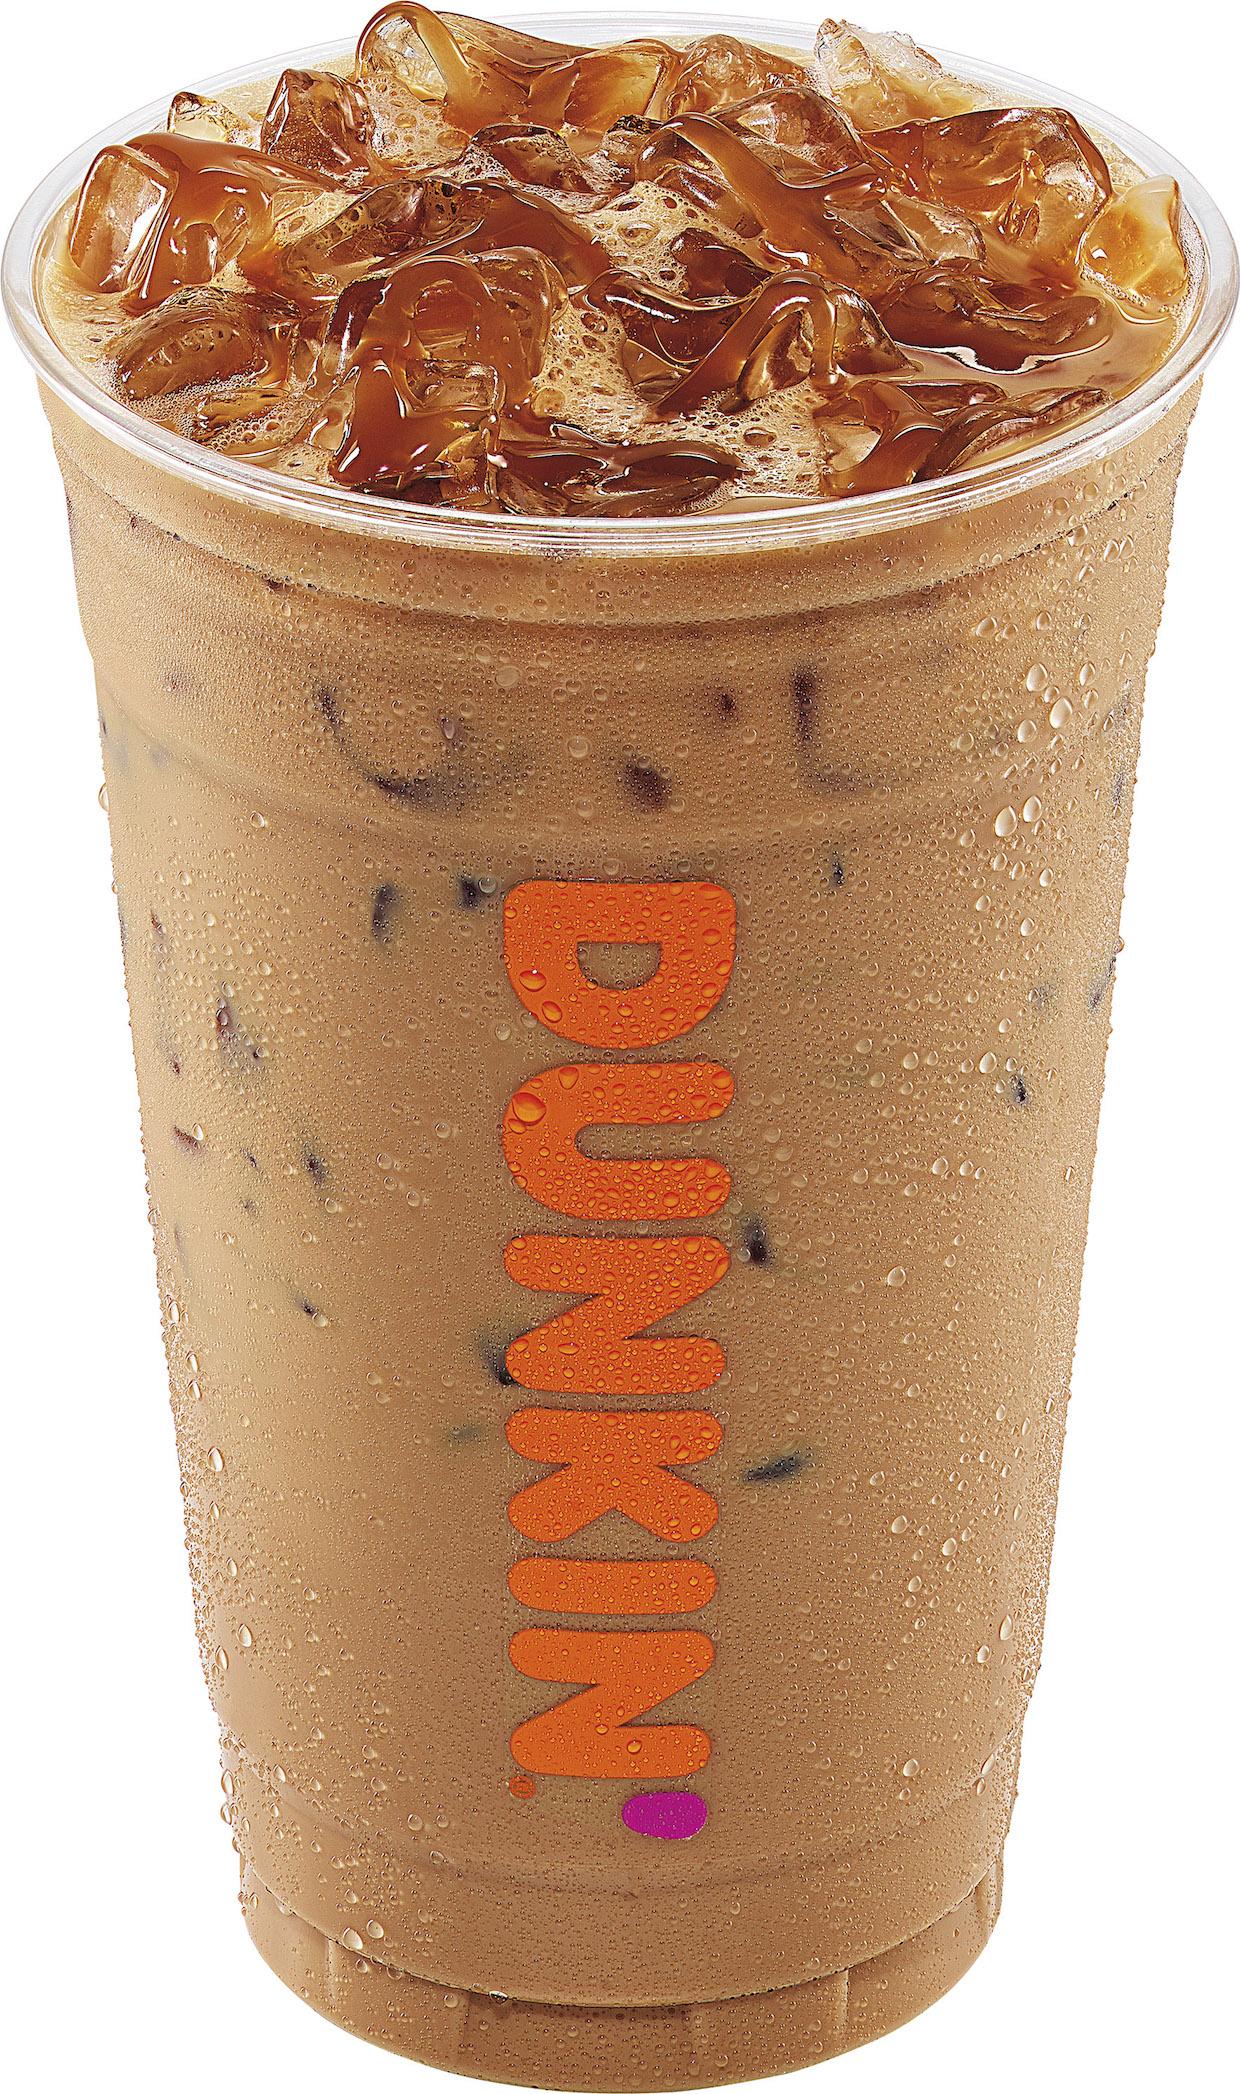 Dunkin' espresso